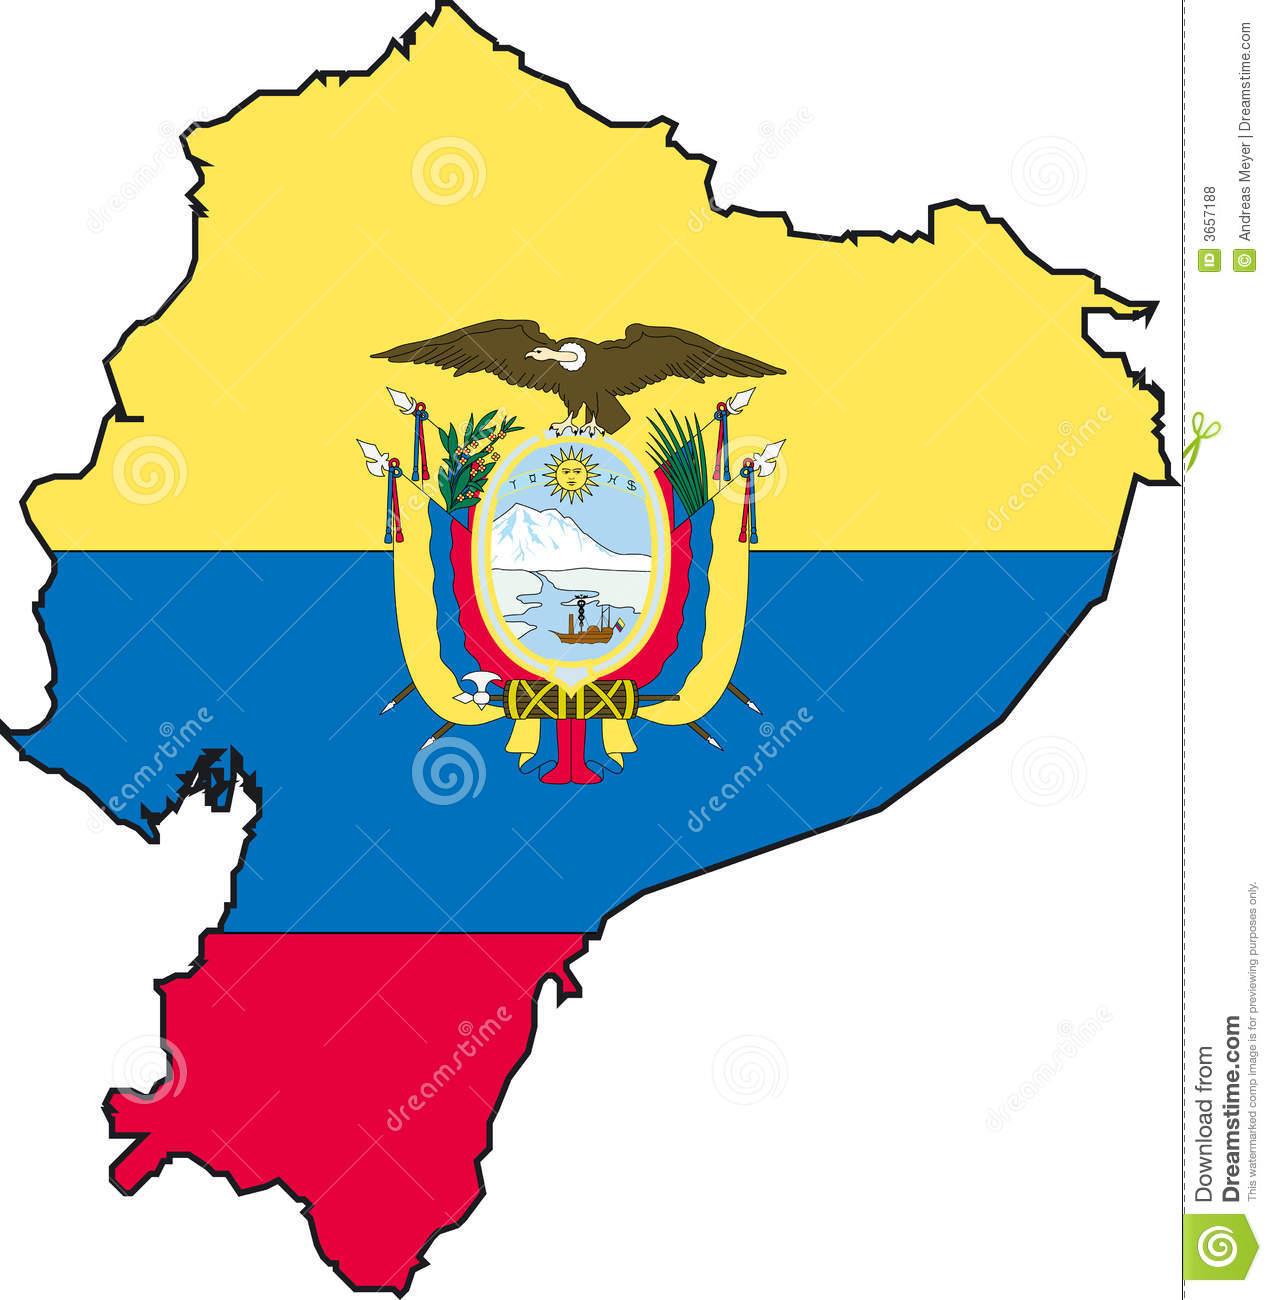 Ecuador clipart #9, Download drawings